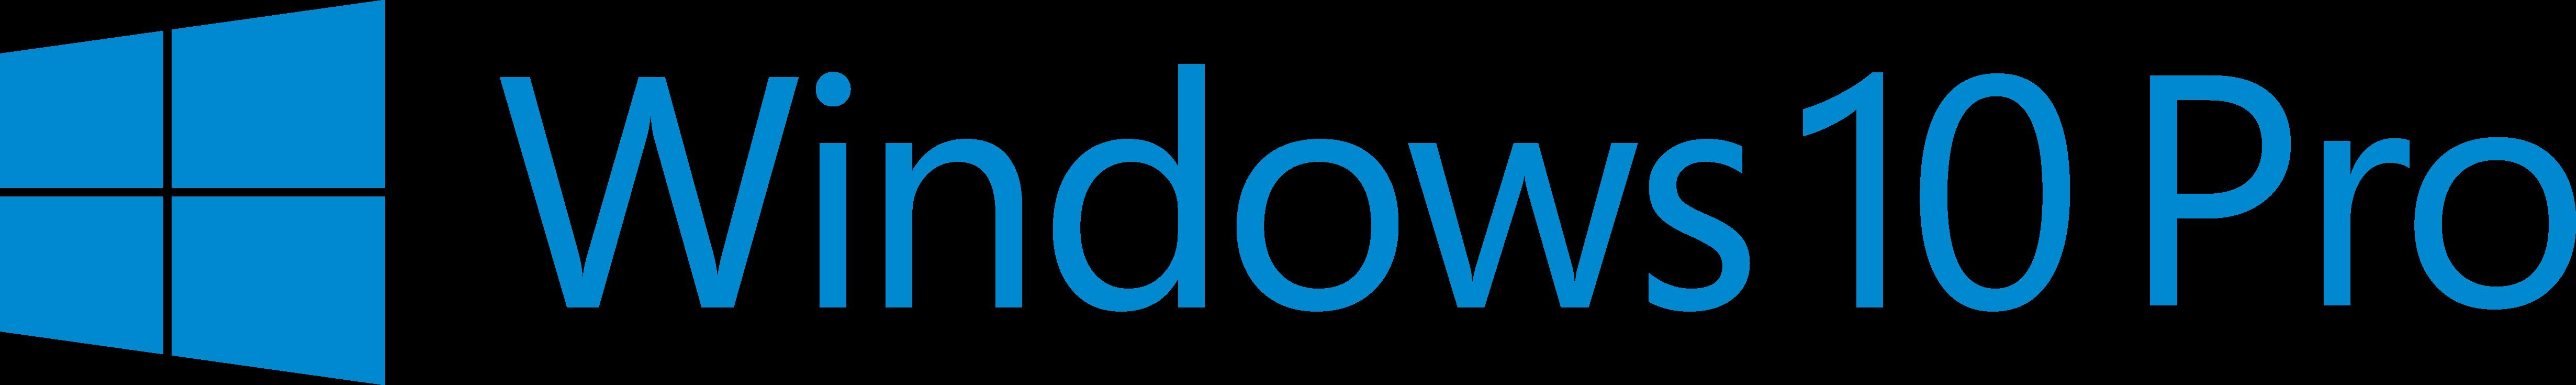 Windows 10 logotype